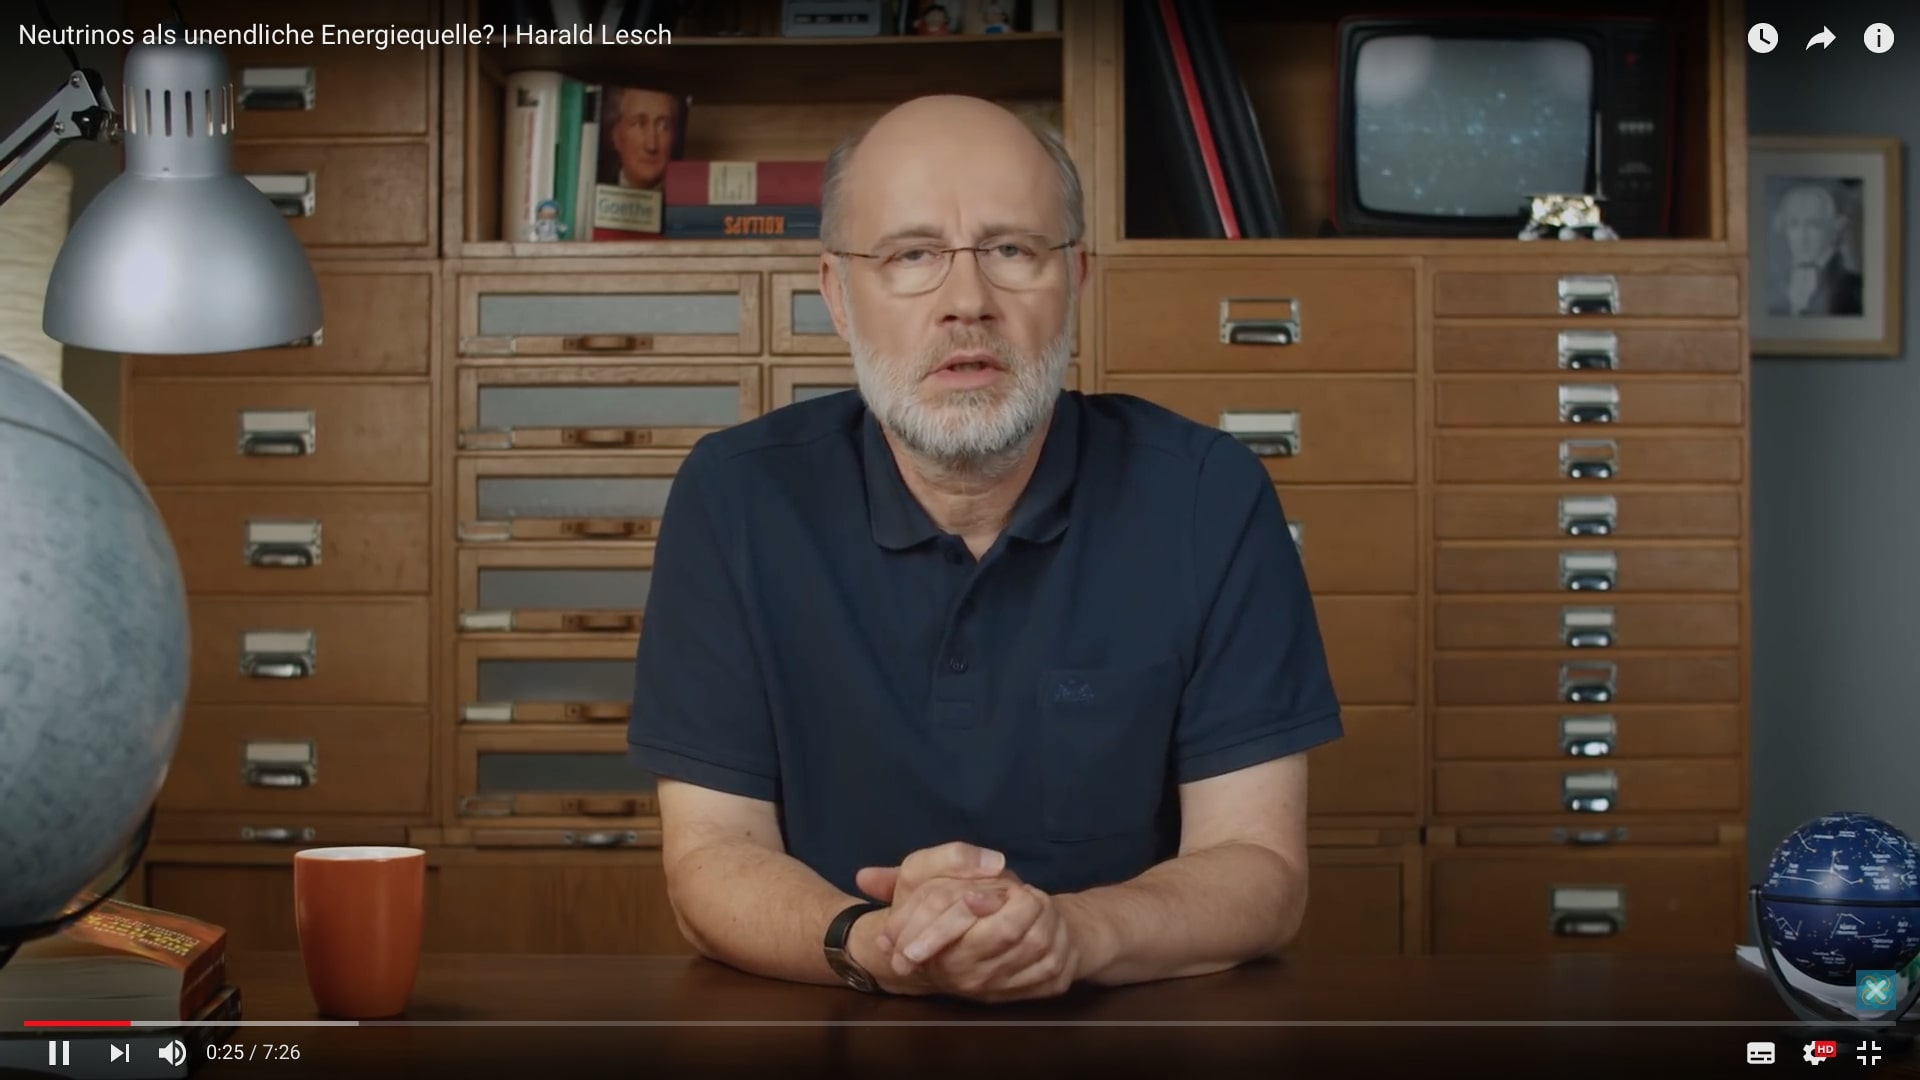 Harald Lesch Neutrinos